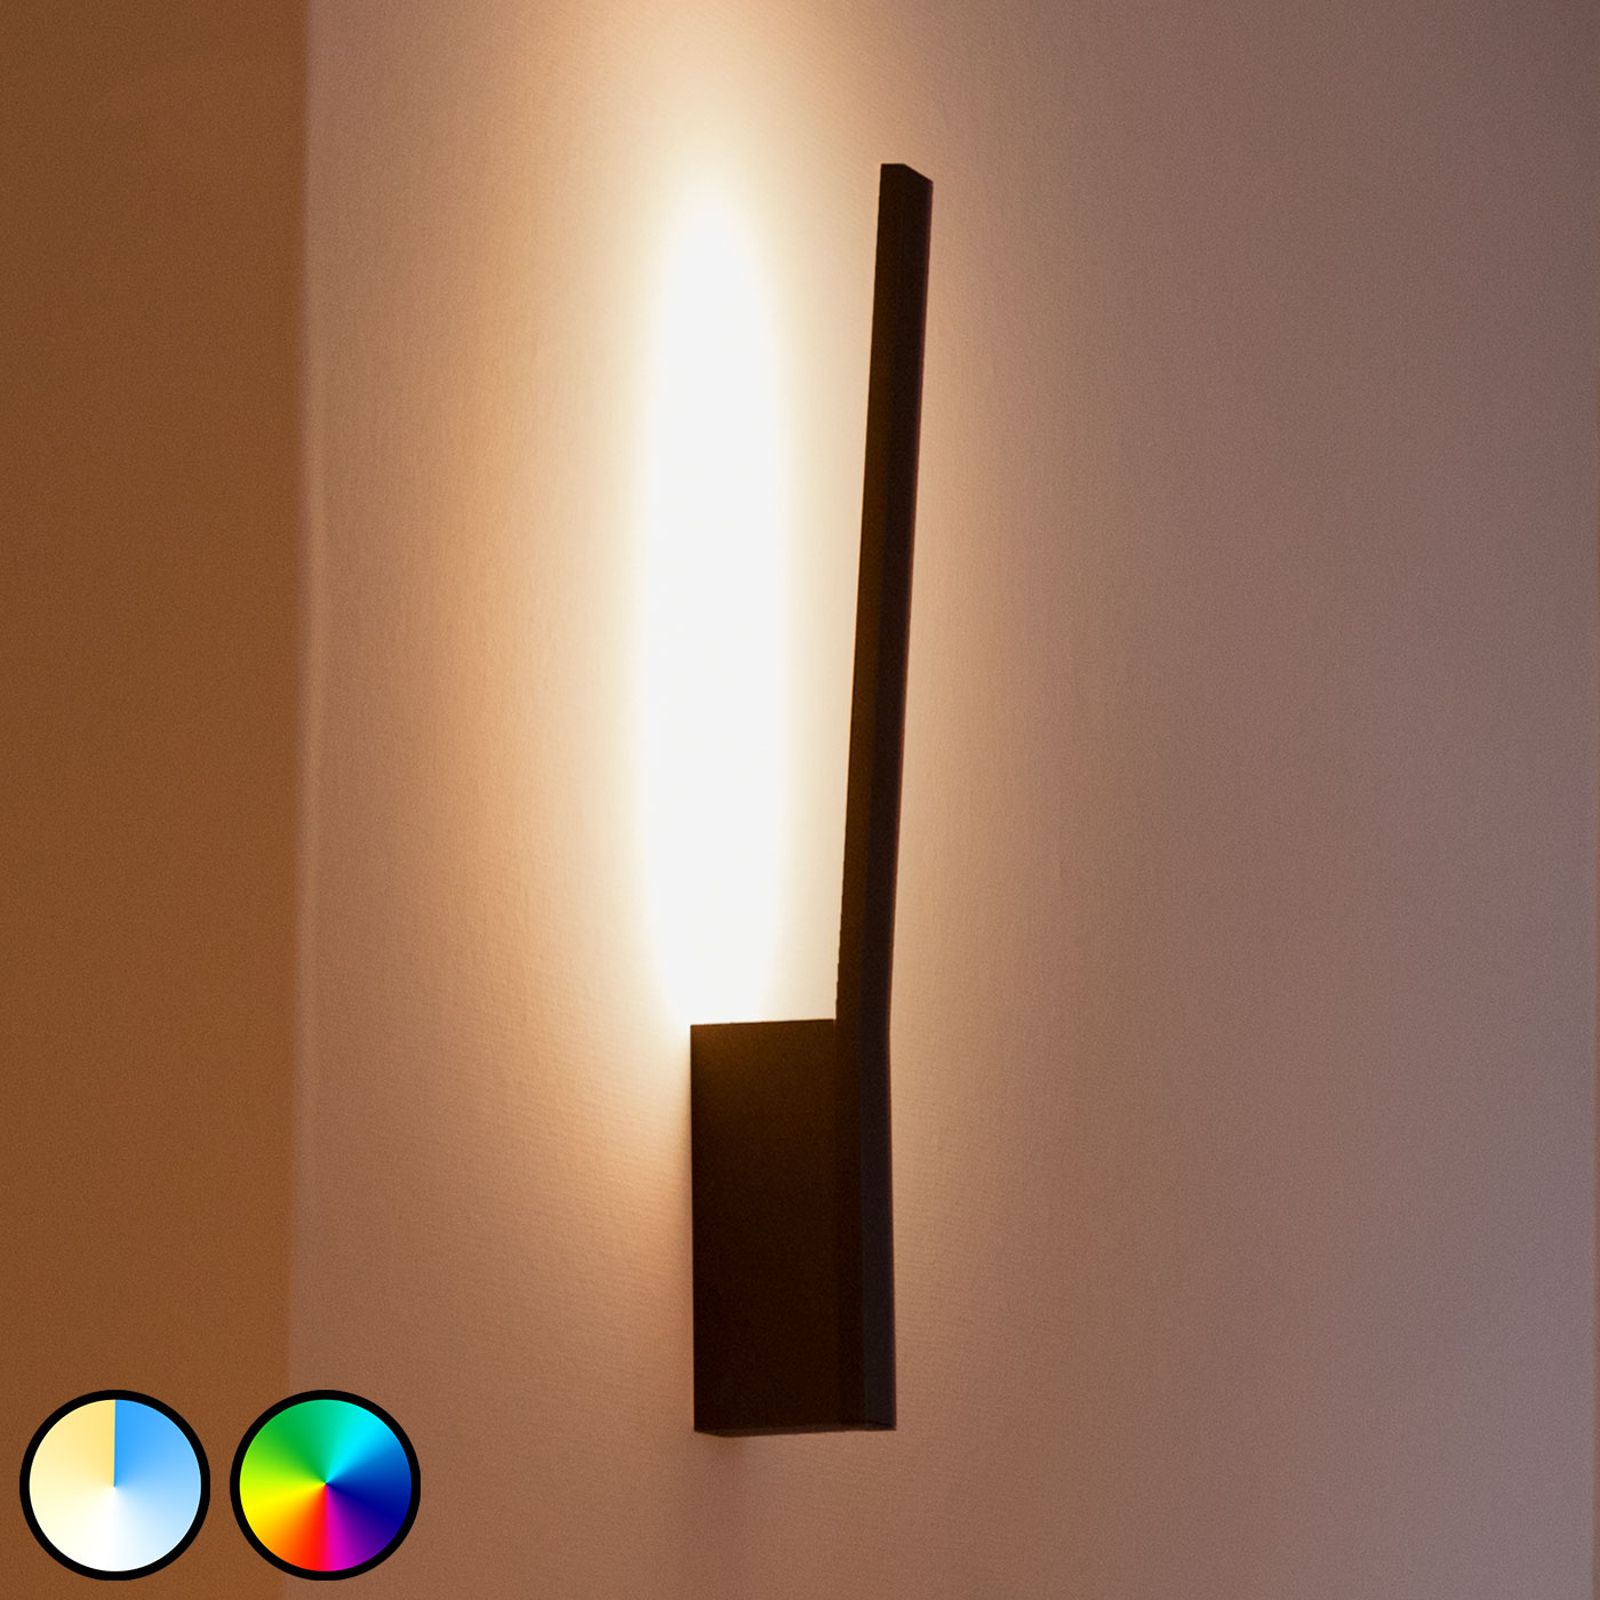 Philips Hue Liane LED-Wandleuchte, RGBW, schwarz